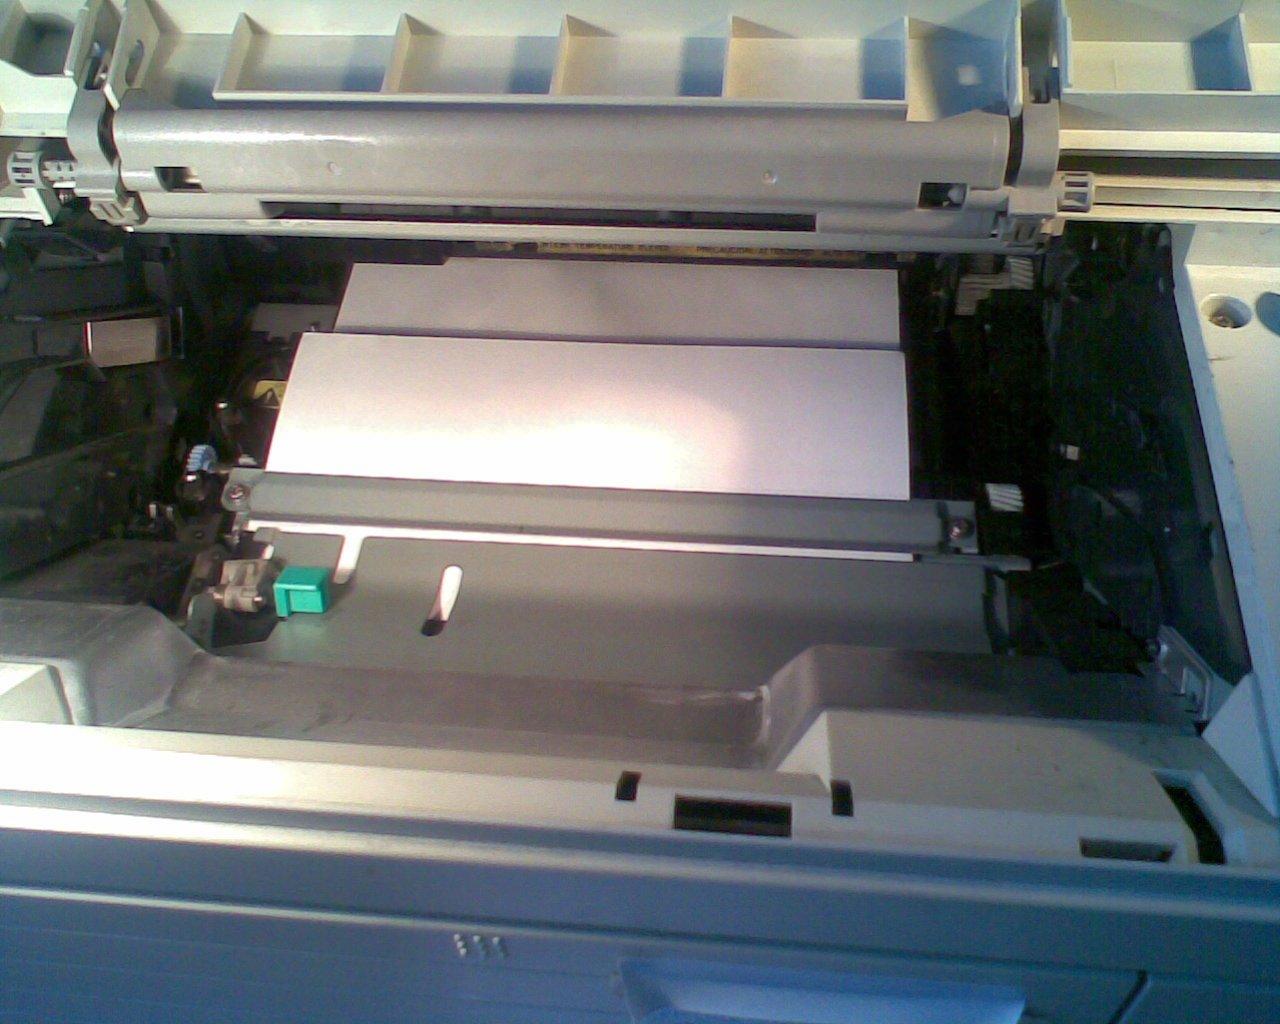 drukarka laserjet 4 plus - 41.3 b��d